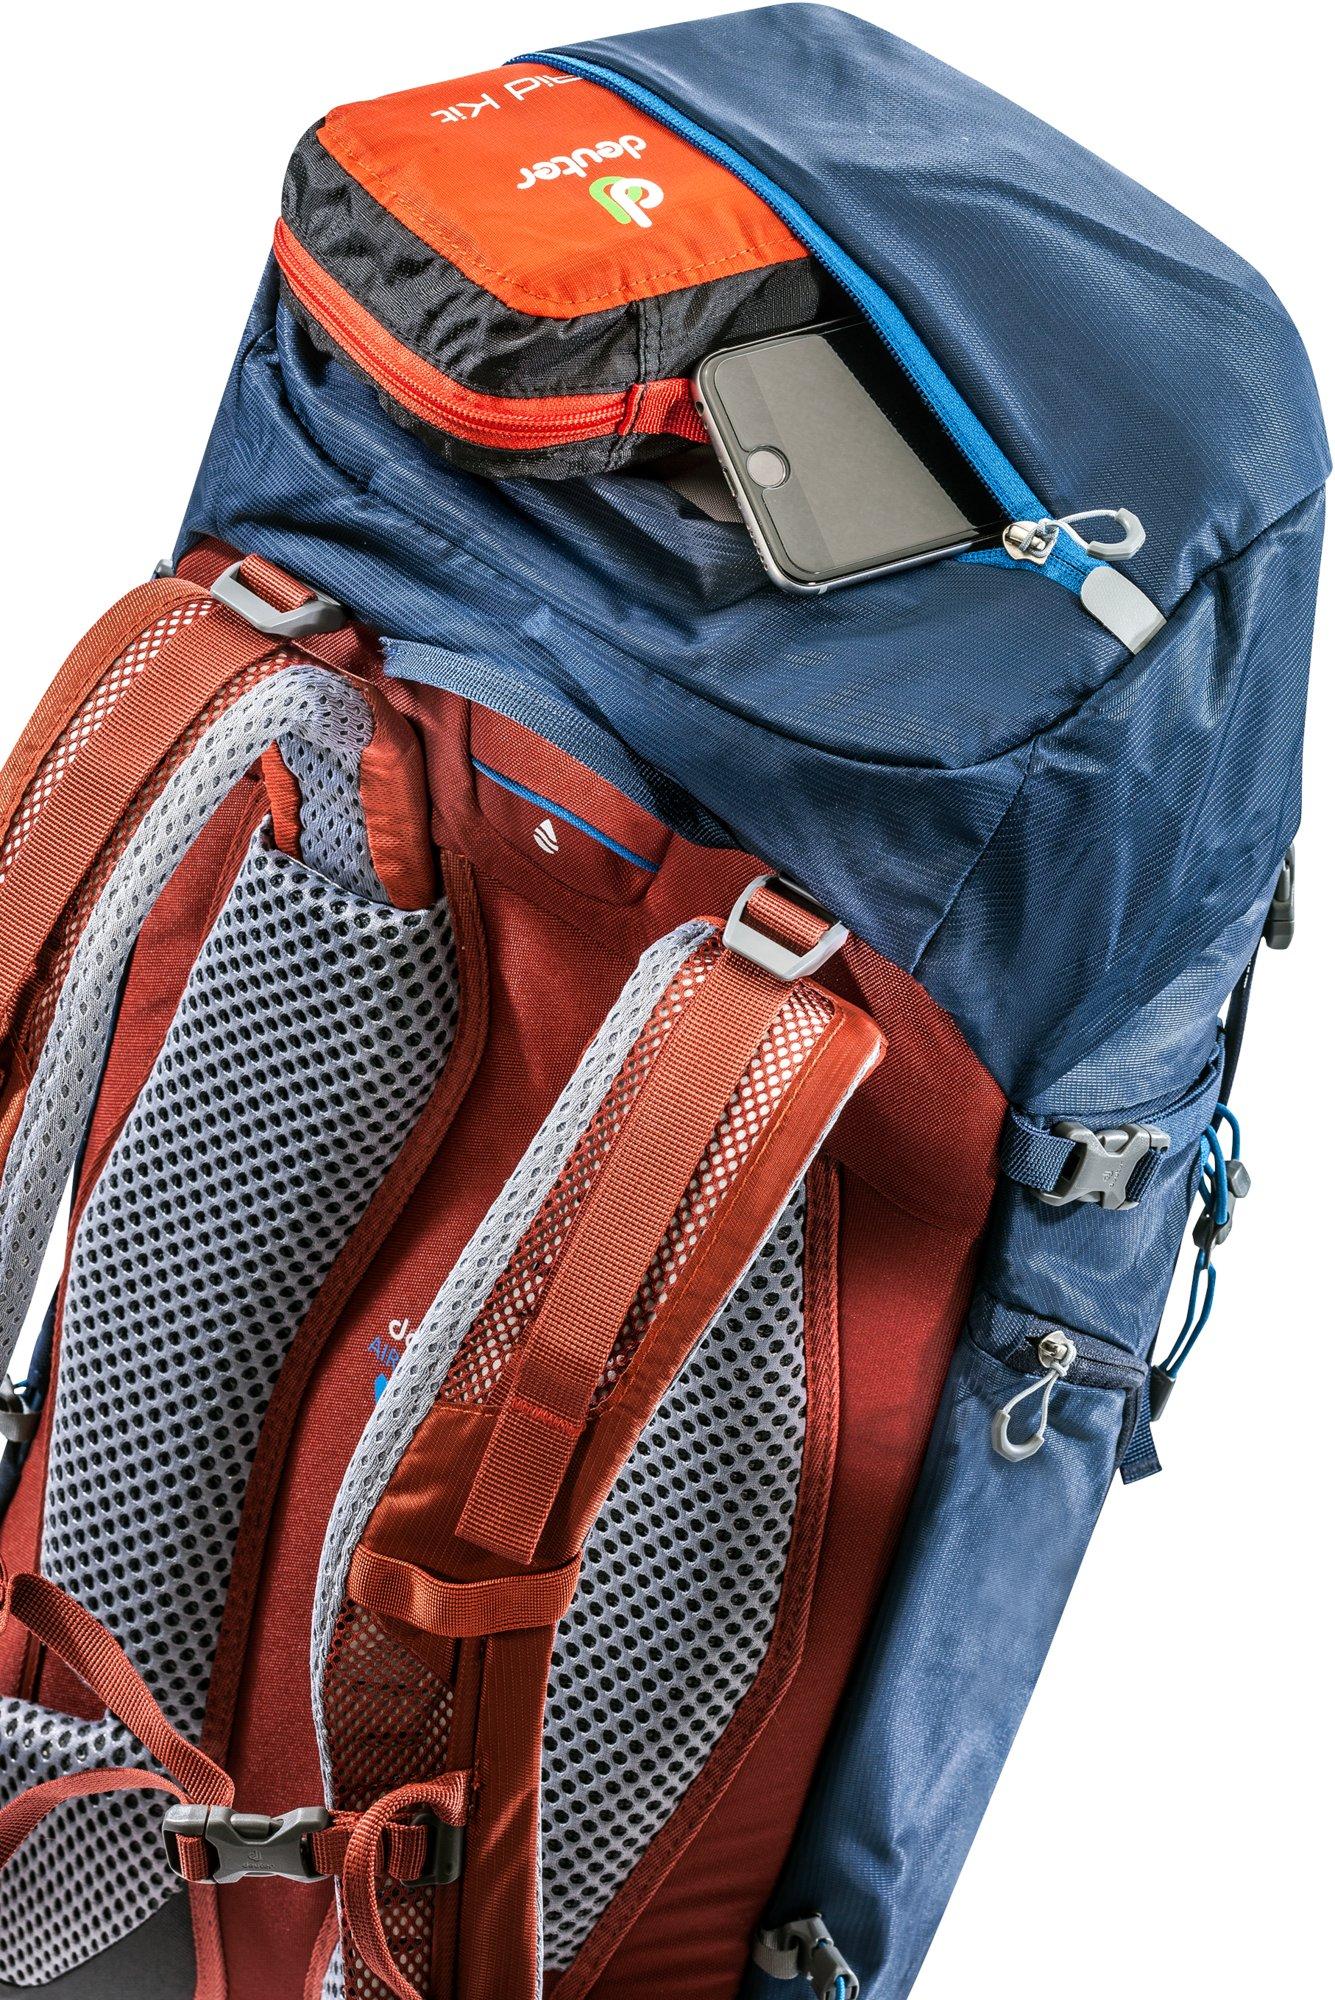 Deuter - Trail Pro 36, Wanderrucksack